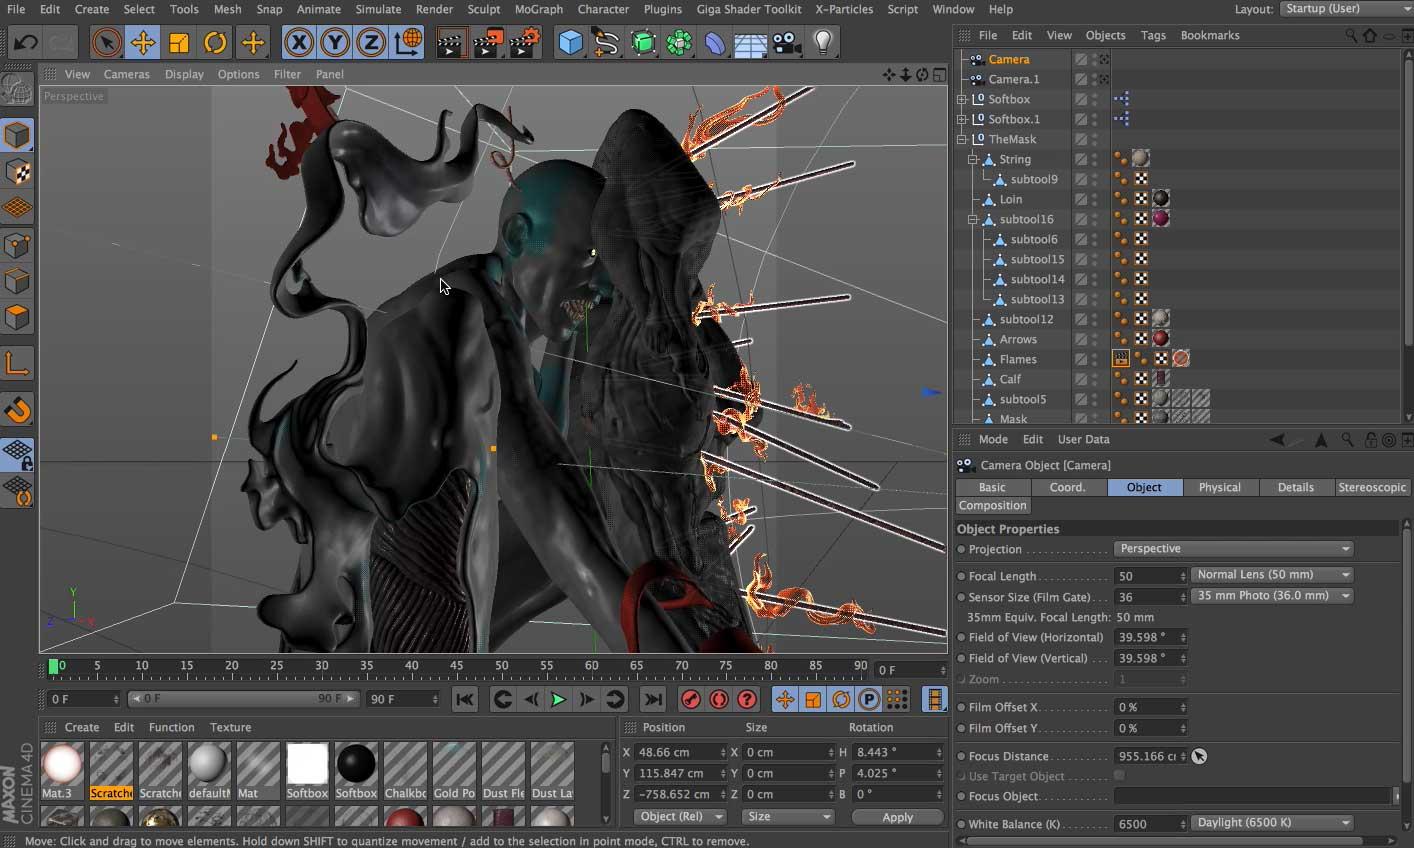 Screen+Capture+2014-04-15+20.41.20+(00002).jpg